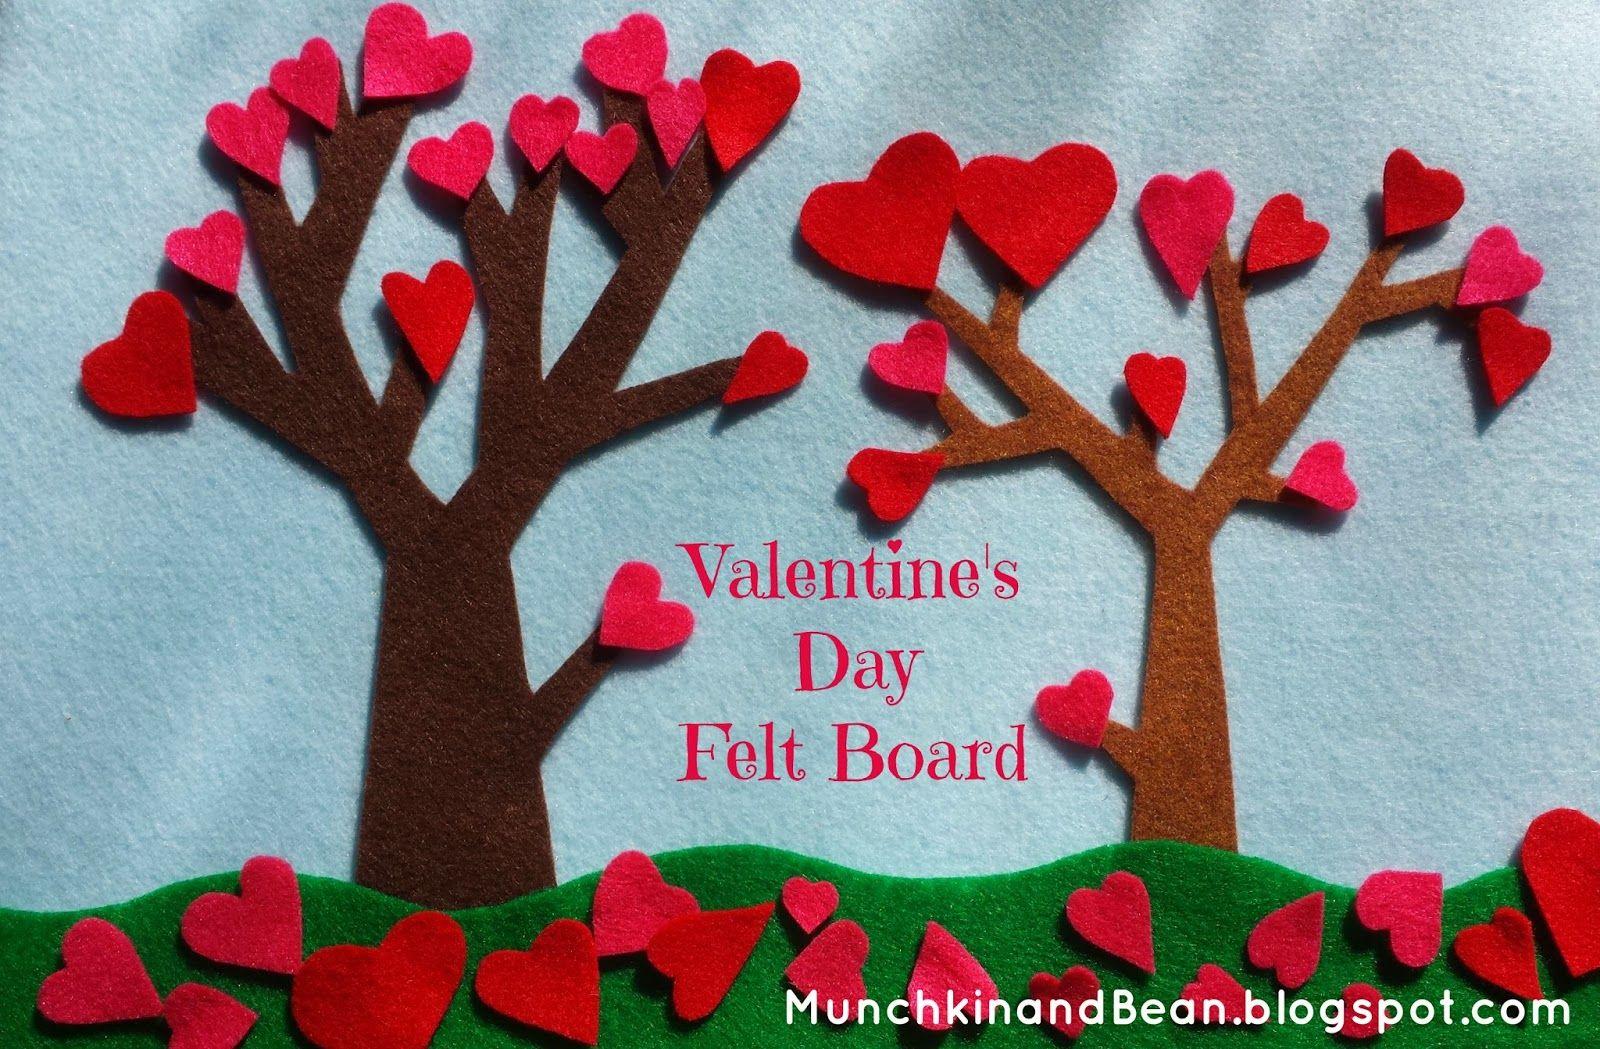 Valentine's Day Felt Board #diycrafts #feltboard #valentinesday